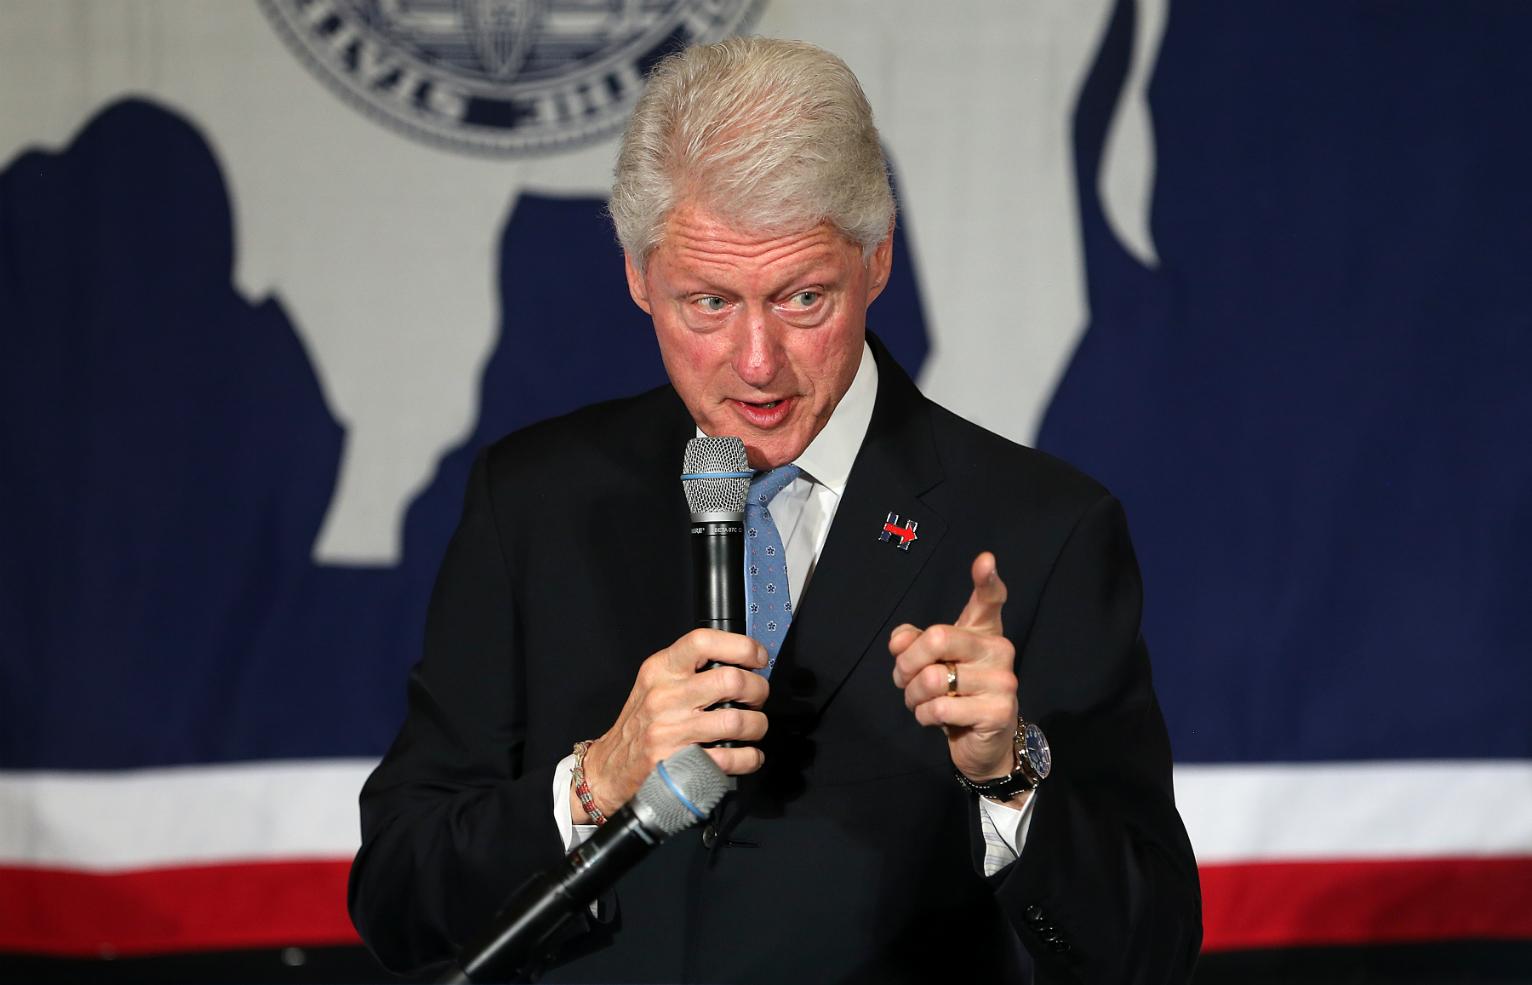 Former President Clinton Defends 1996 Crime Bill, 'Super